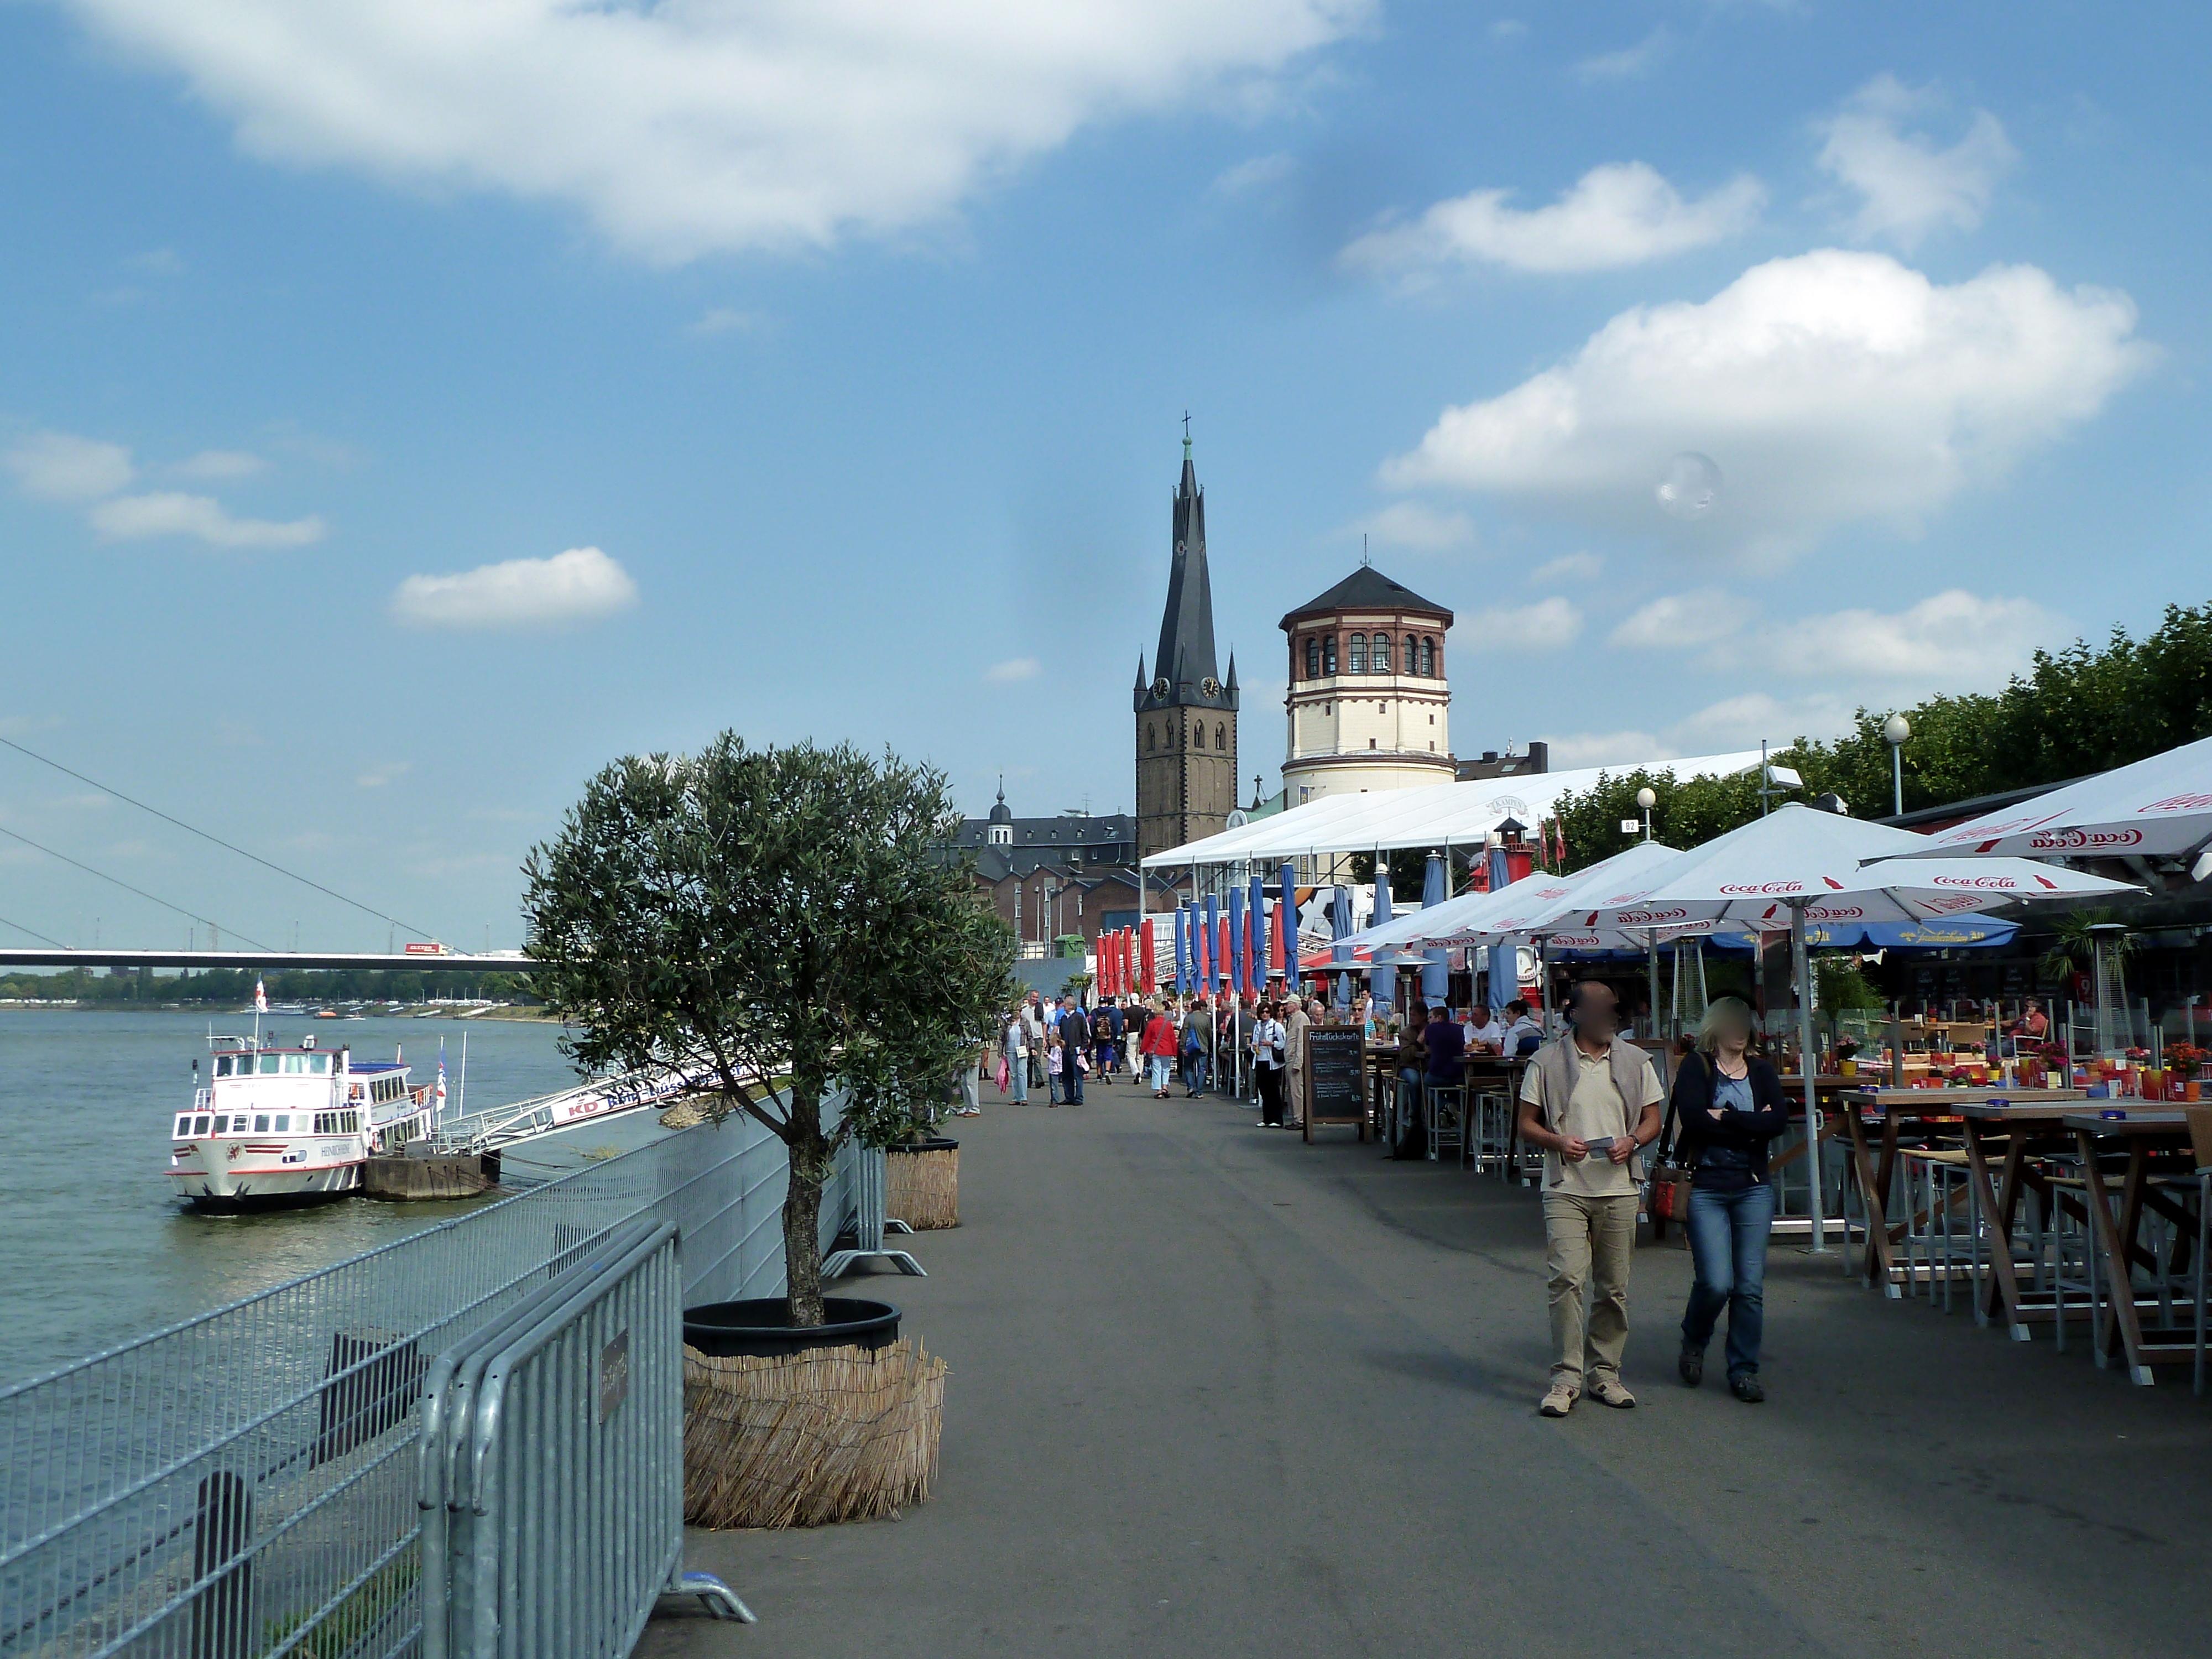 Düsseldorf Rheinuferpromenade Restaurant